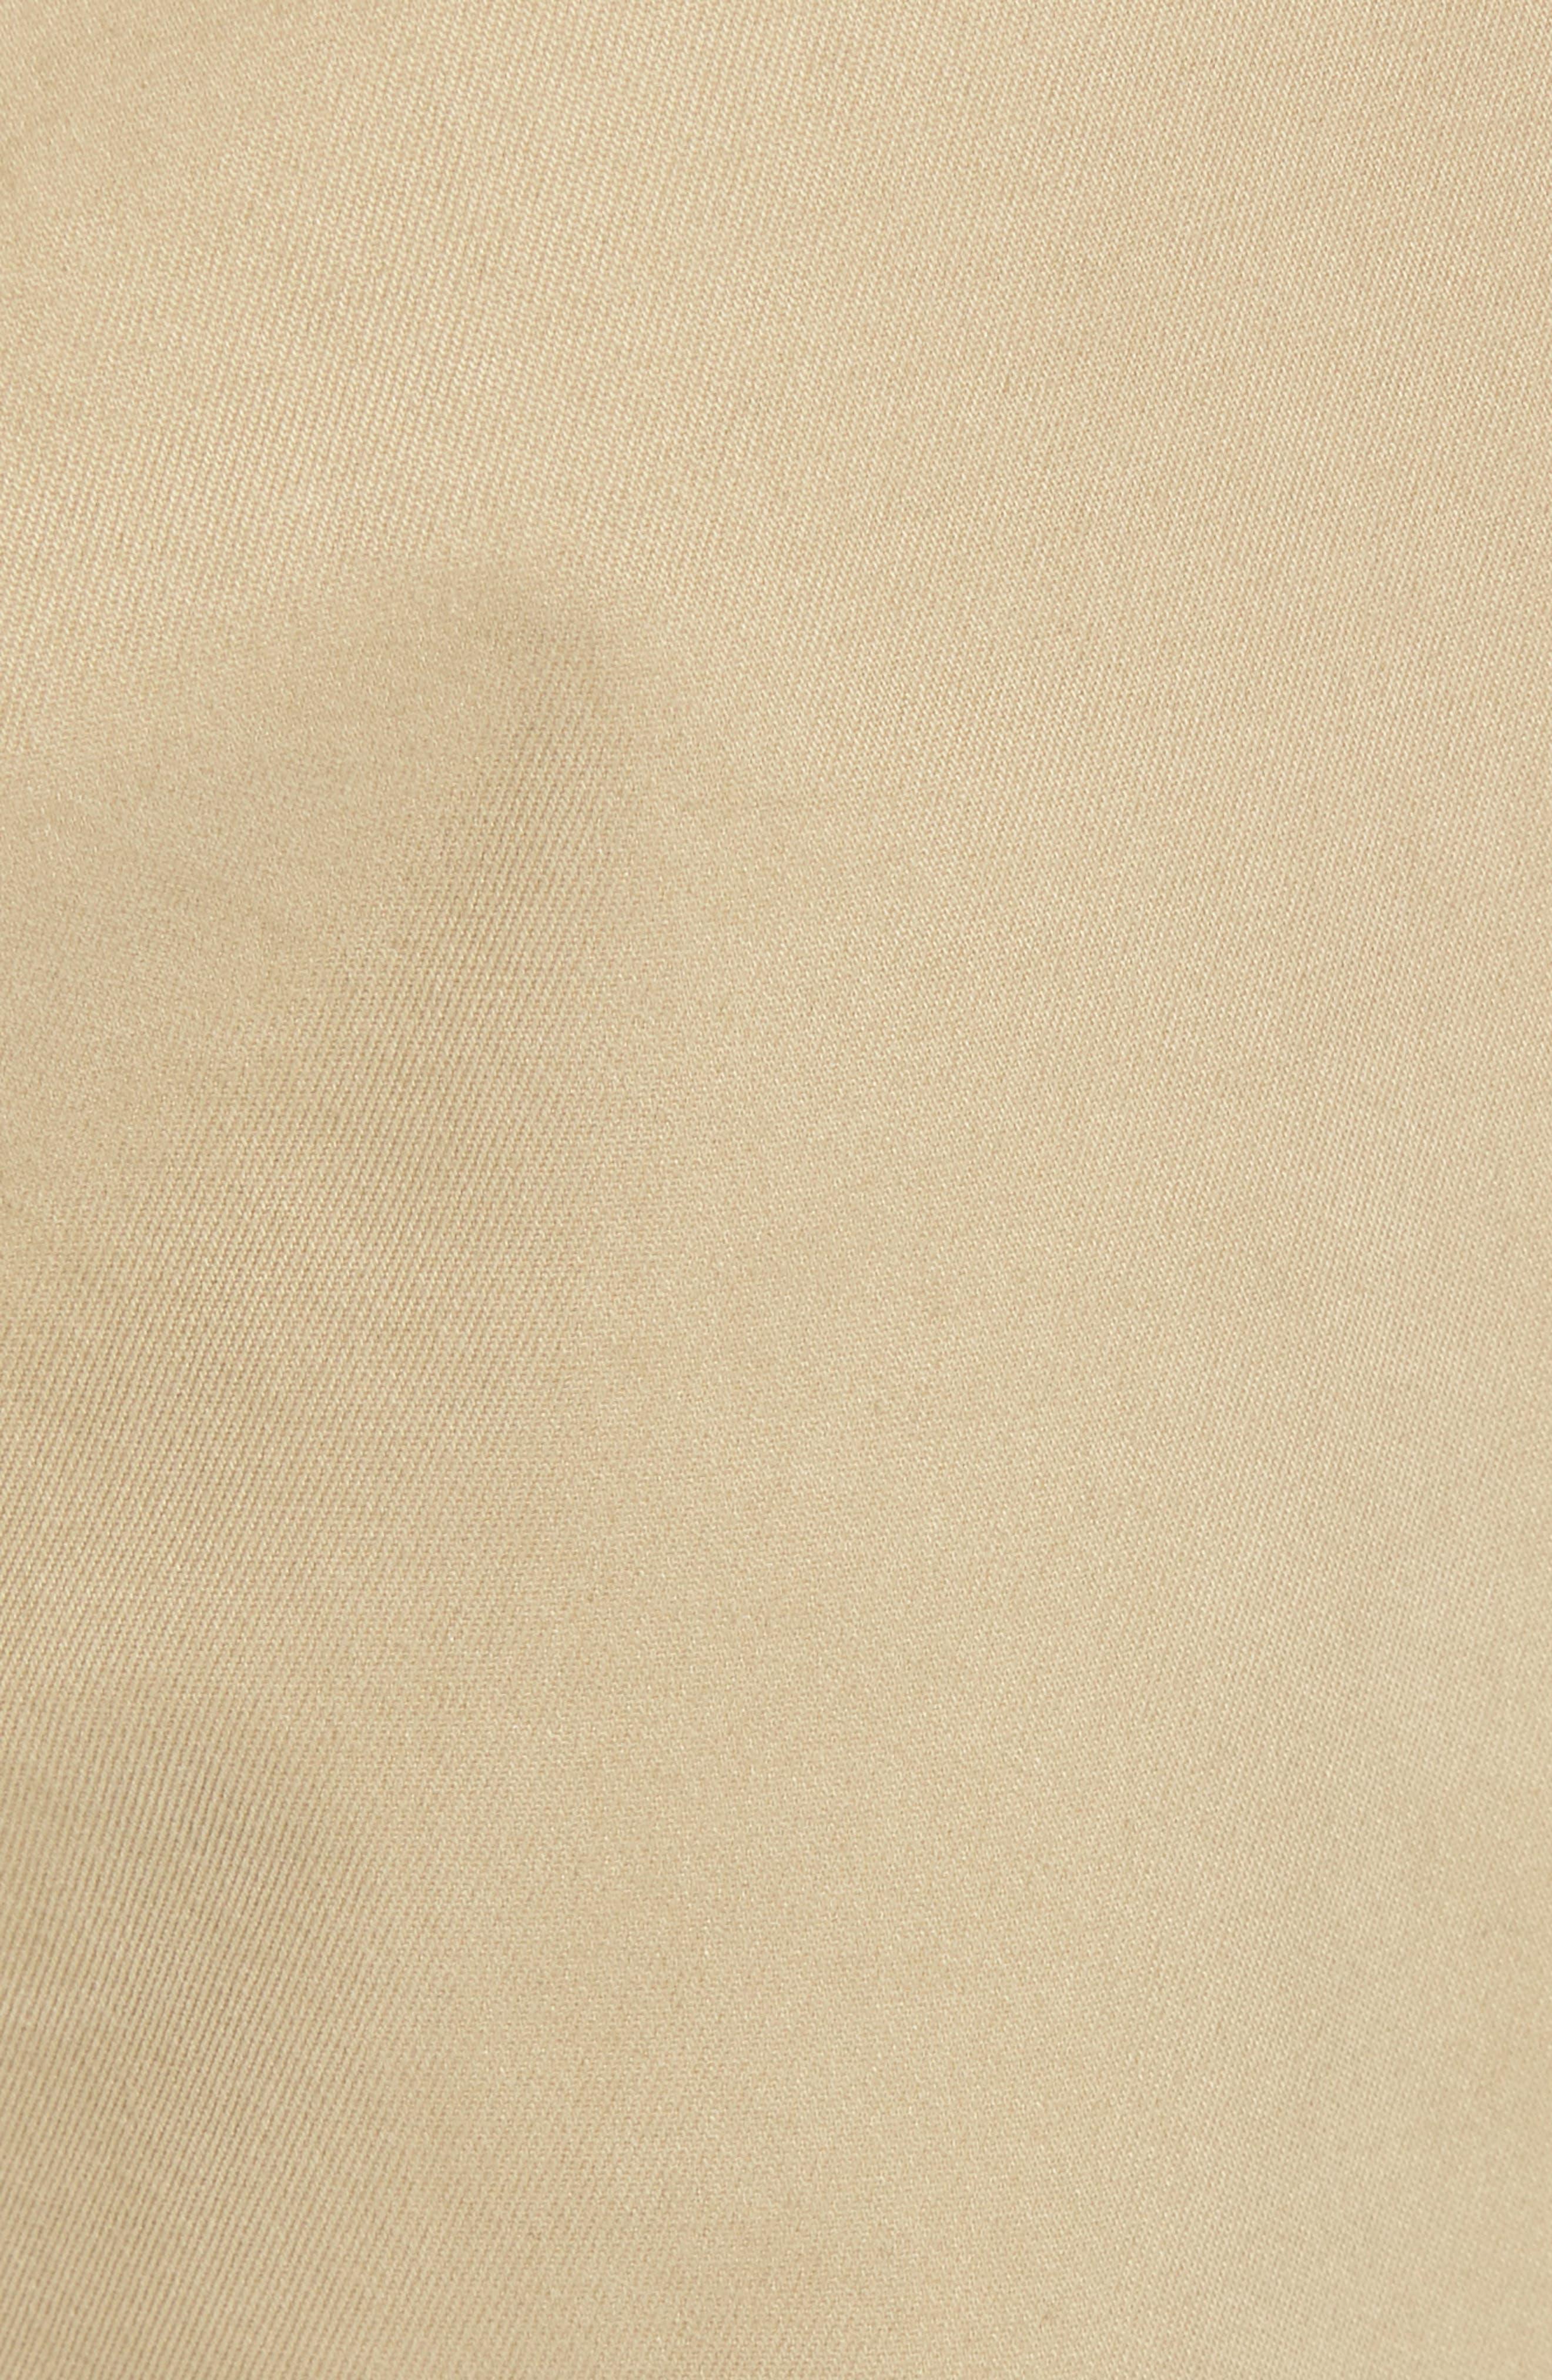 Flat Front Chino Pants,                             Alternate thumbnail 5, color,                             250